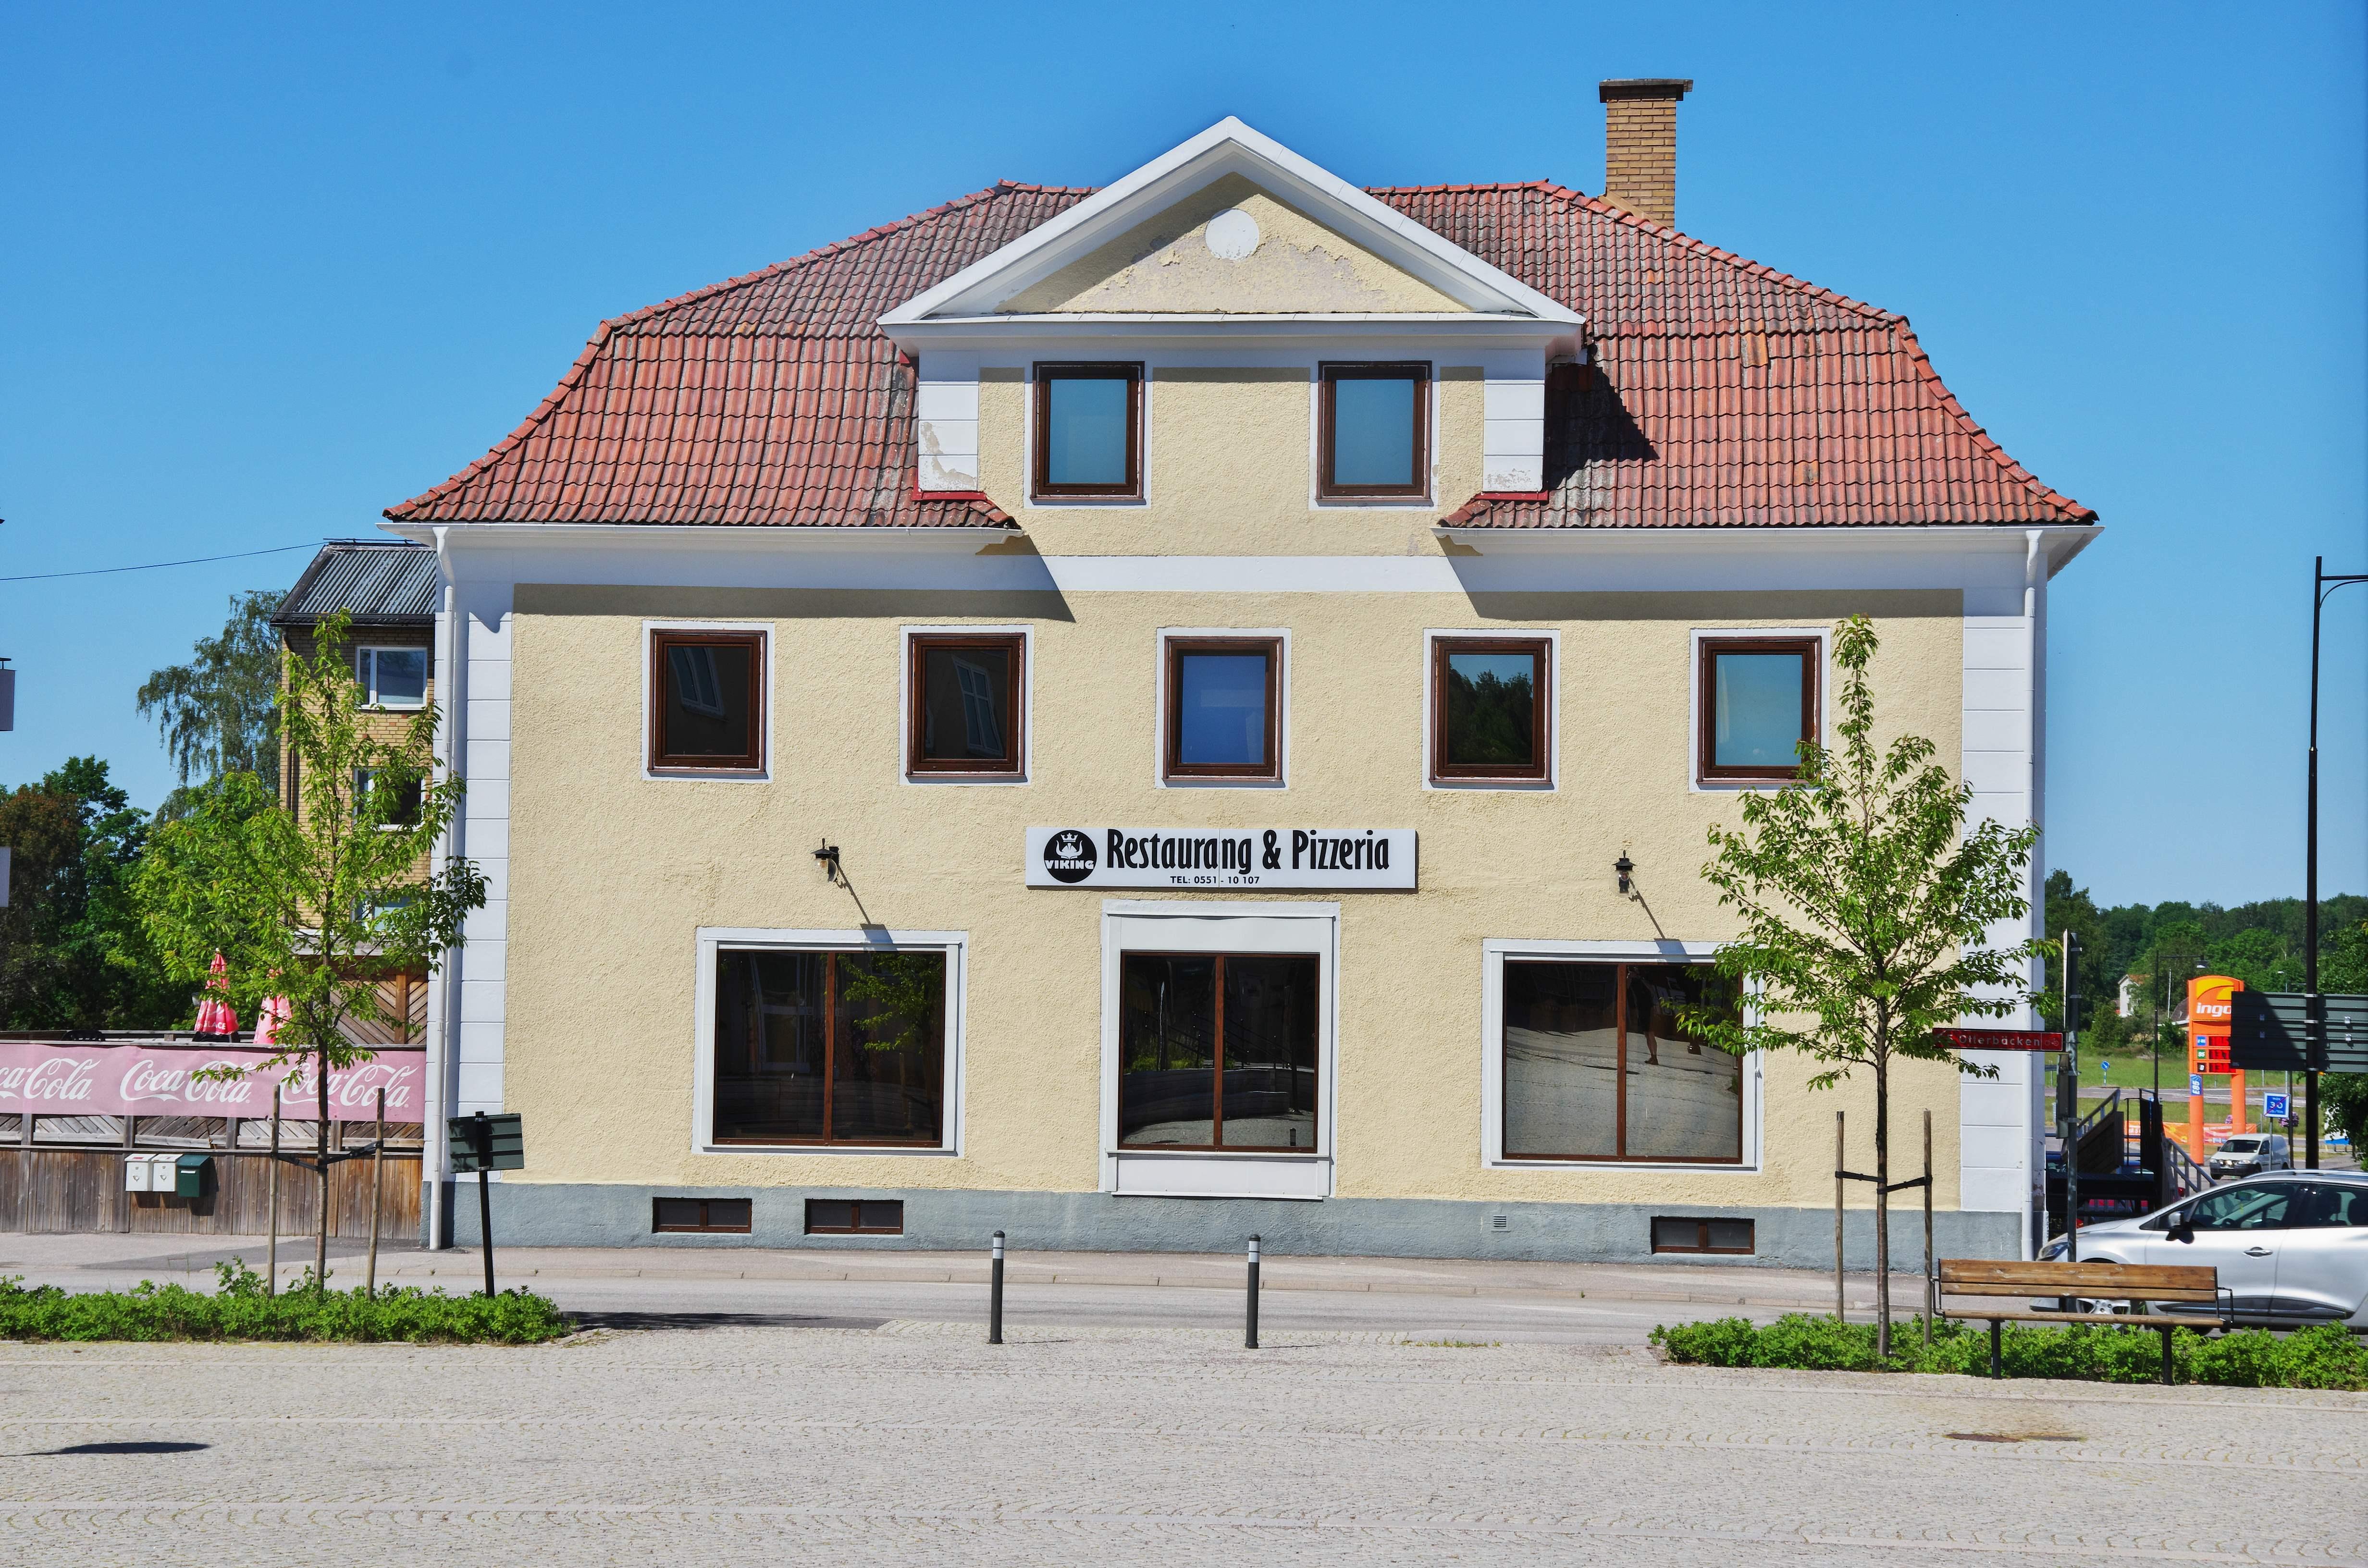 Gullspång dating site